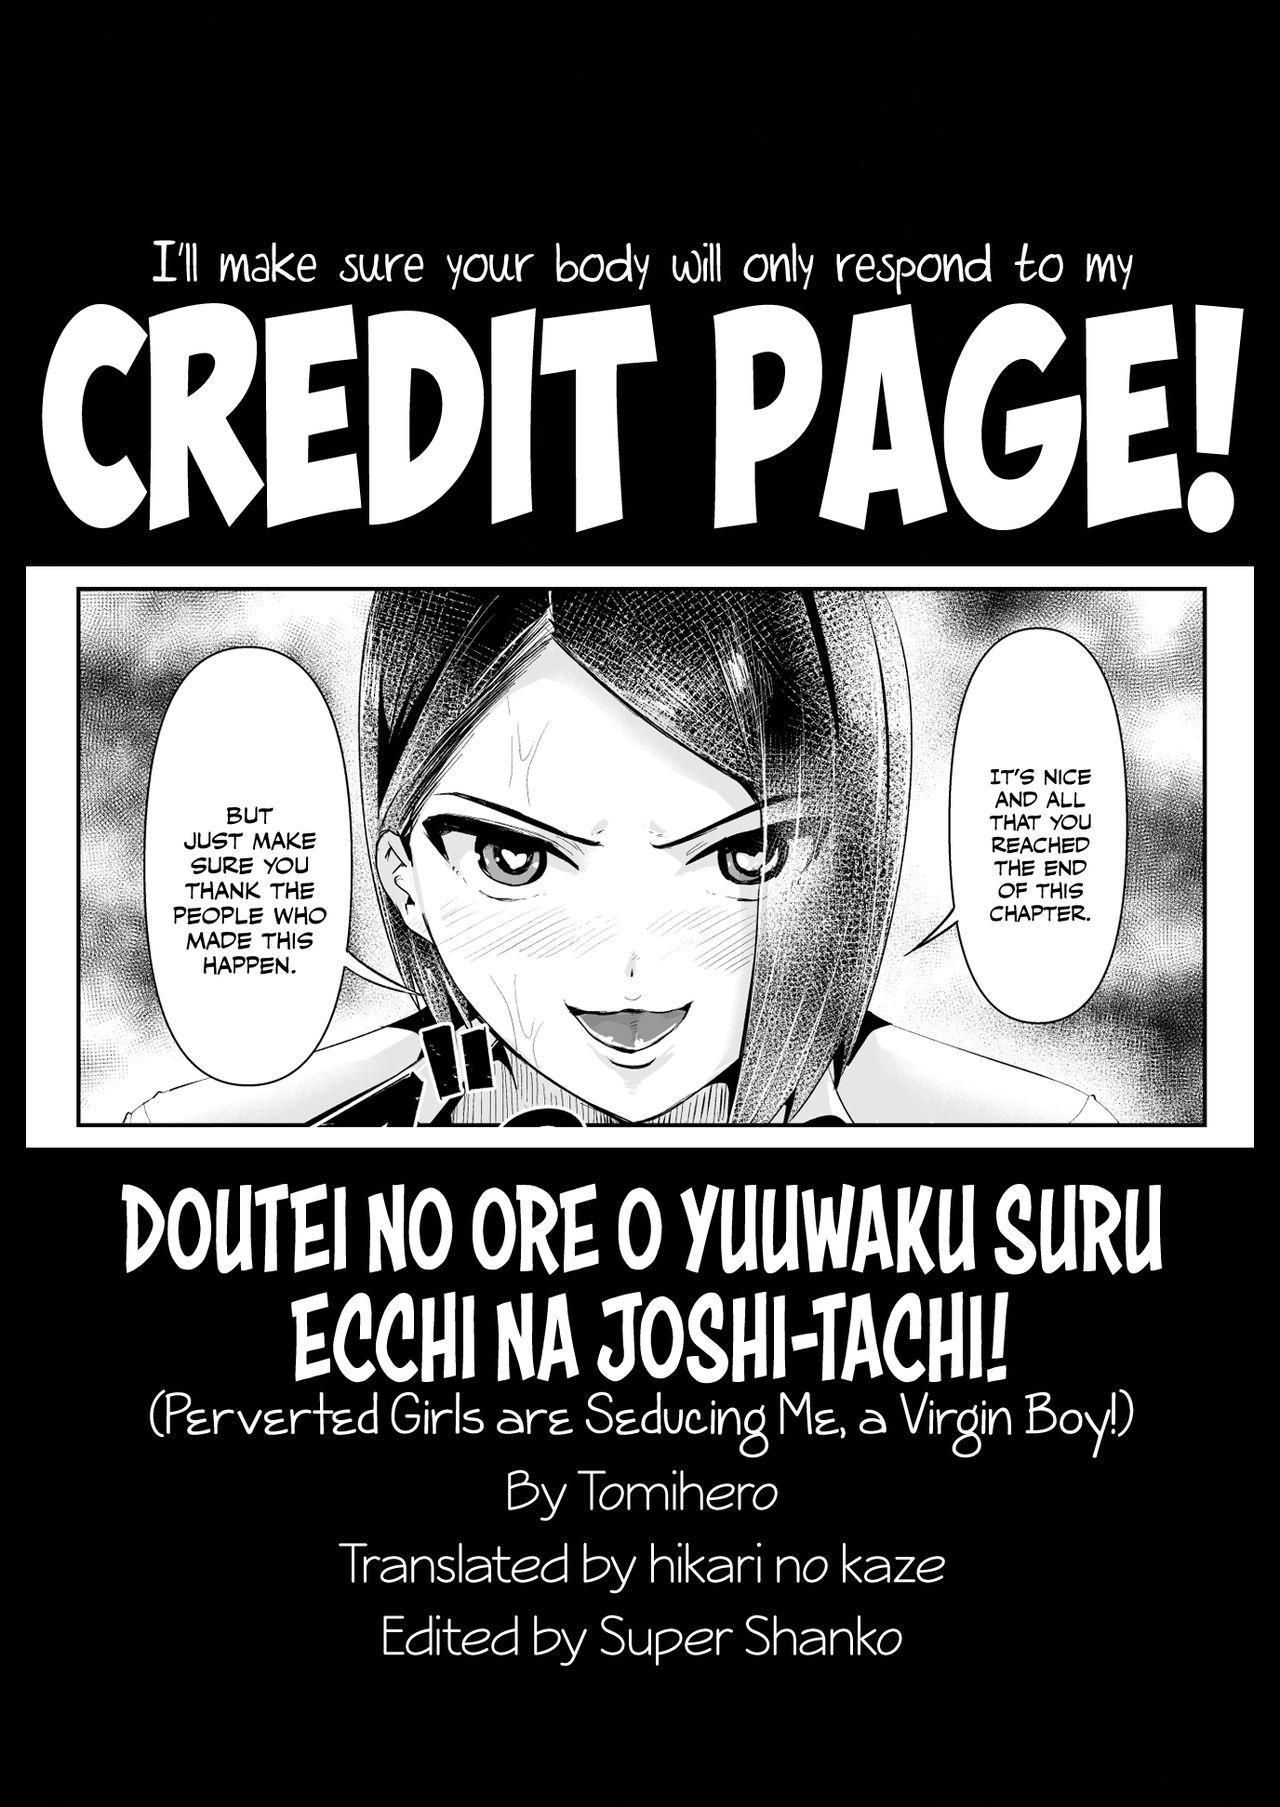 Doutei no Ore o Yuuwaku suru Ecchi na Joshi-tachi!? 10   Perverted Girls are Seducing Me, a Virgin Boy!? 10 19